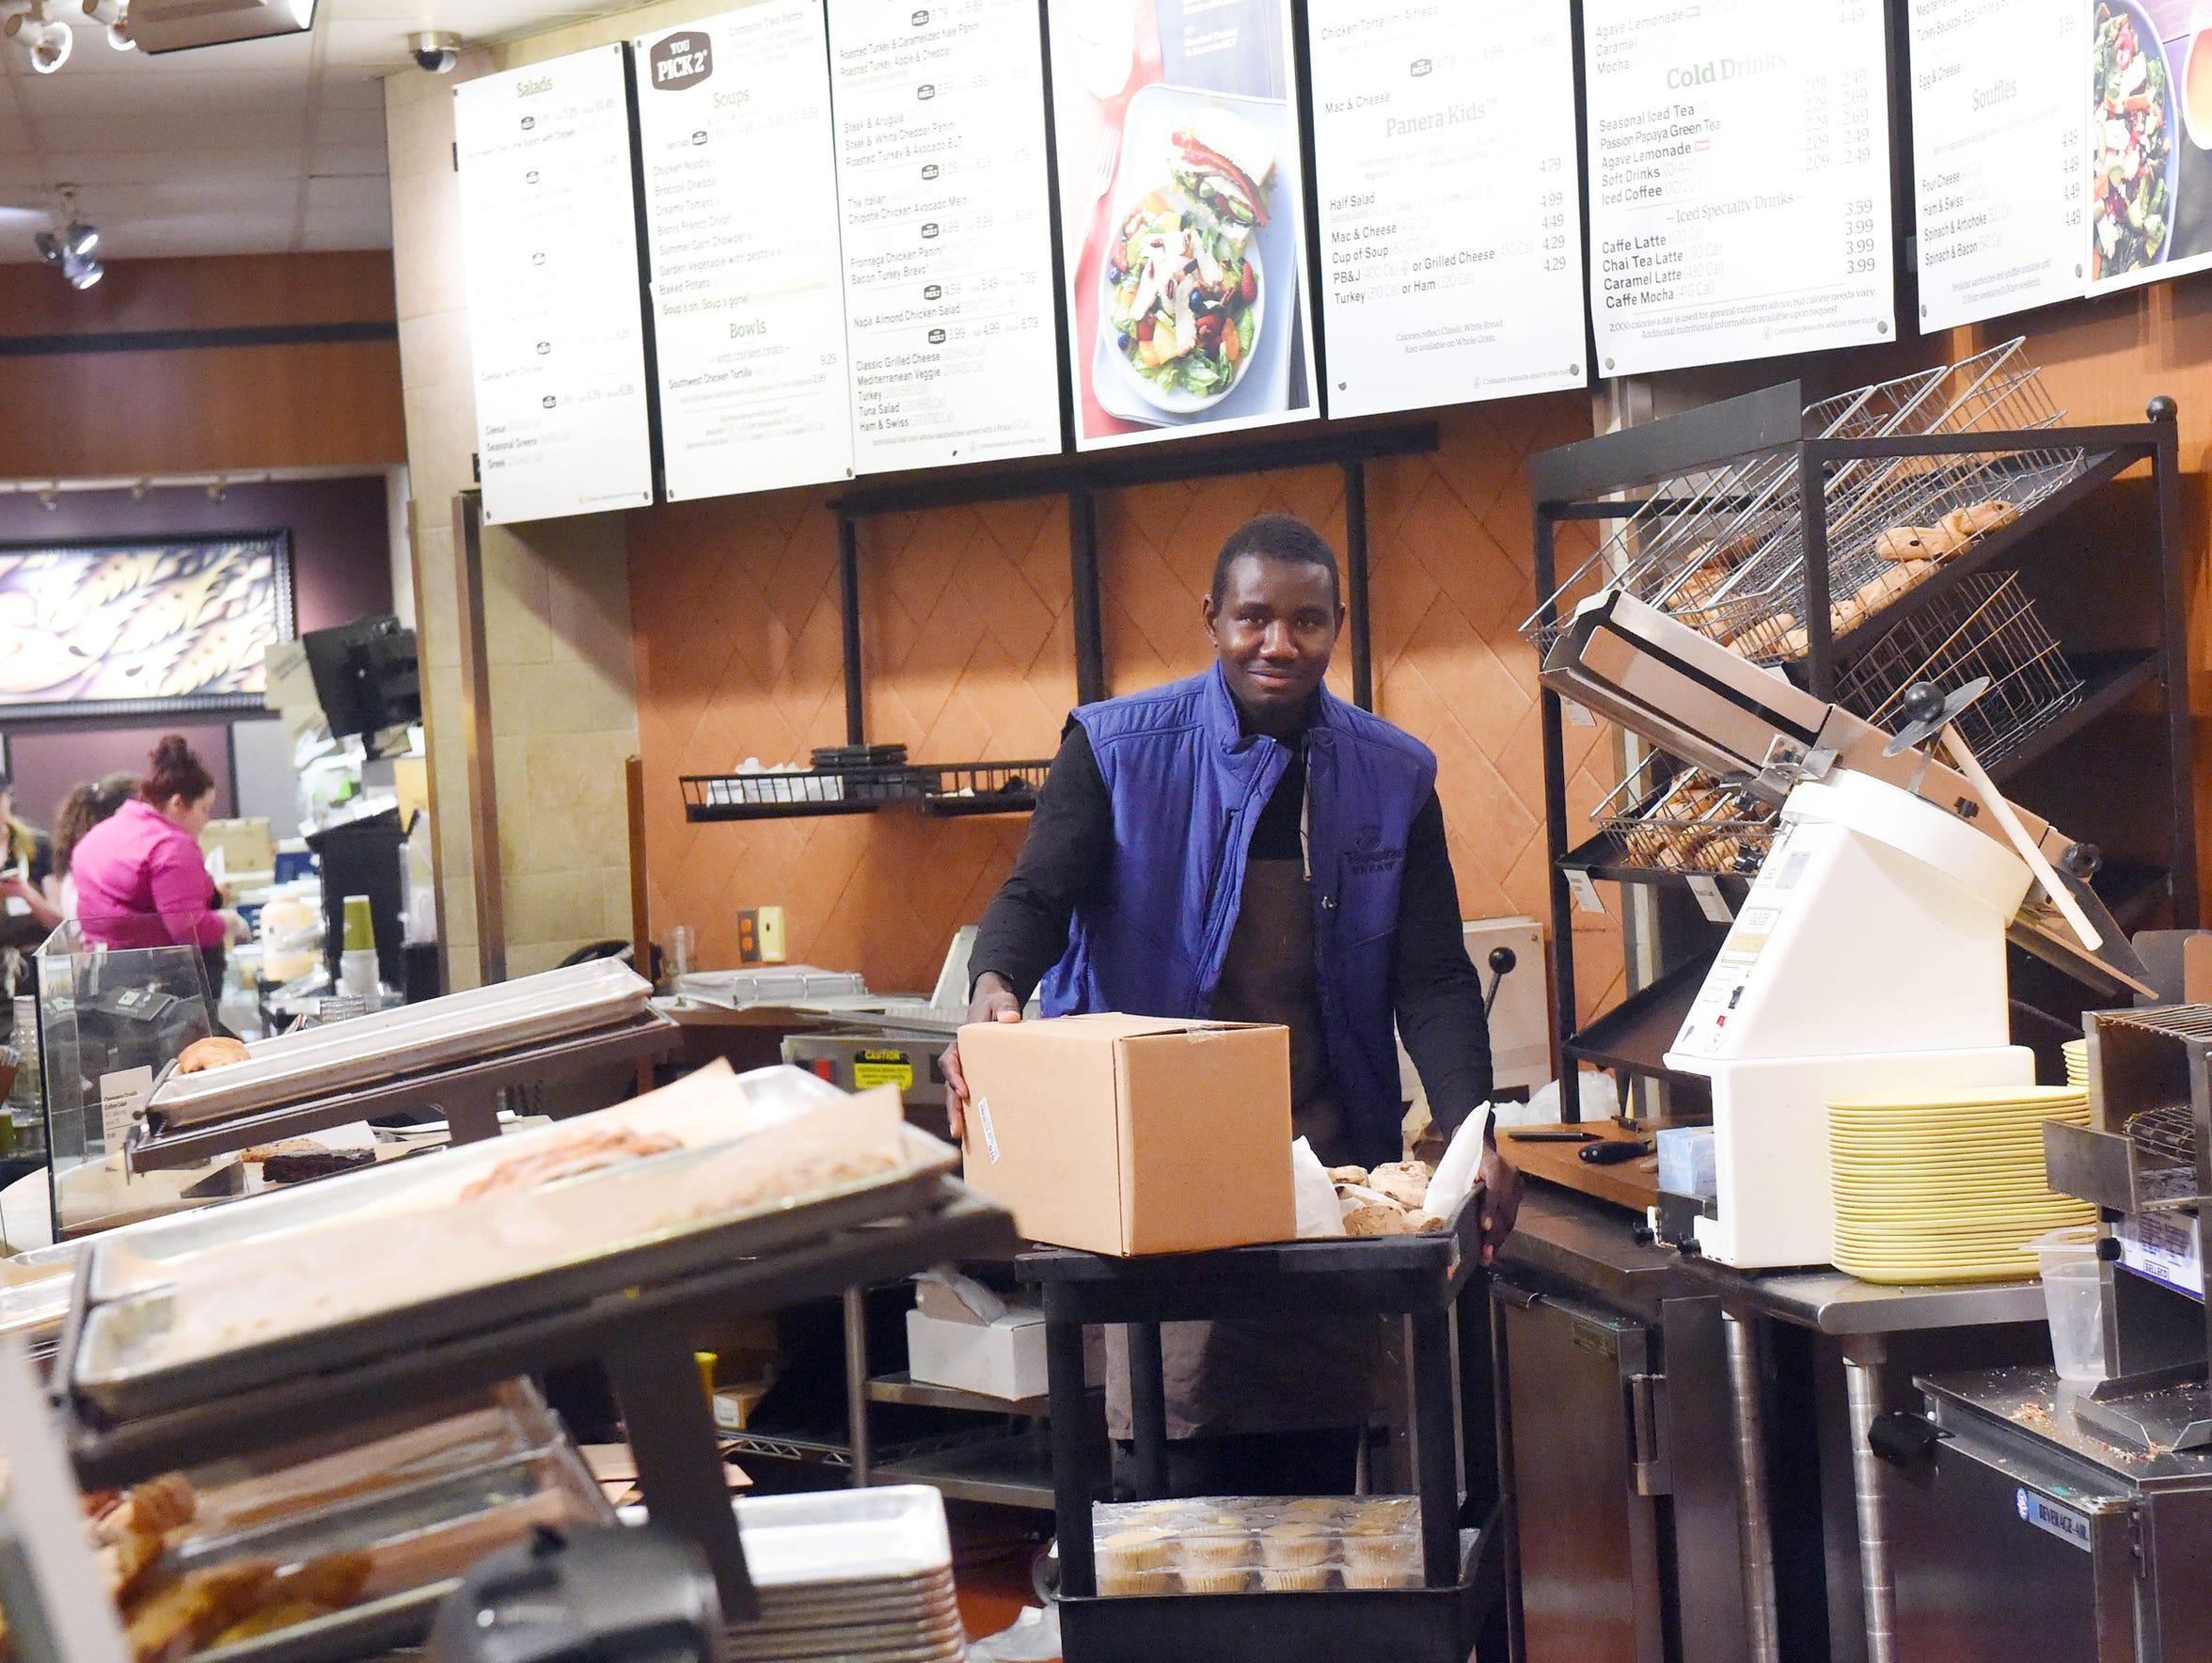 Abdelrahman Abshir pushes a cart behind the counter.